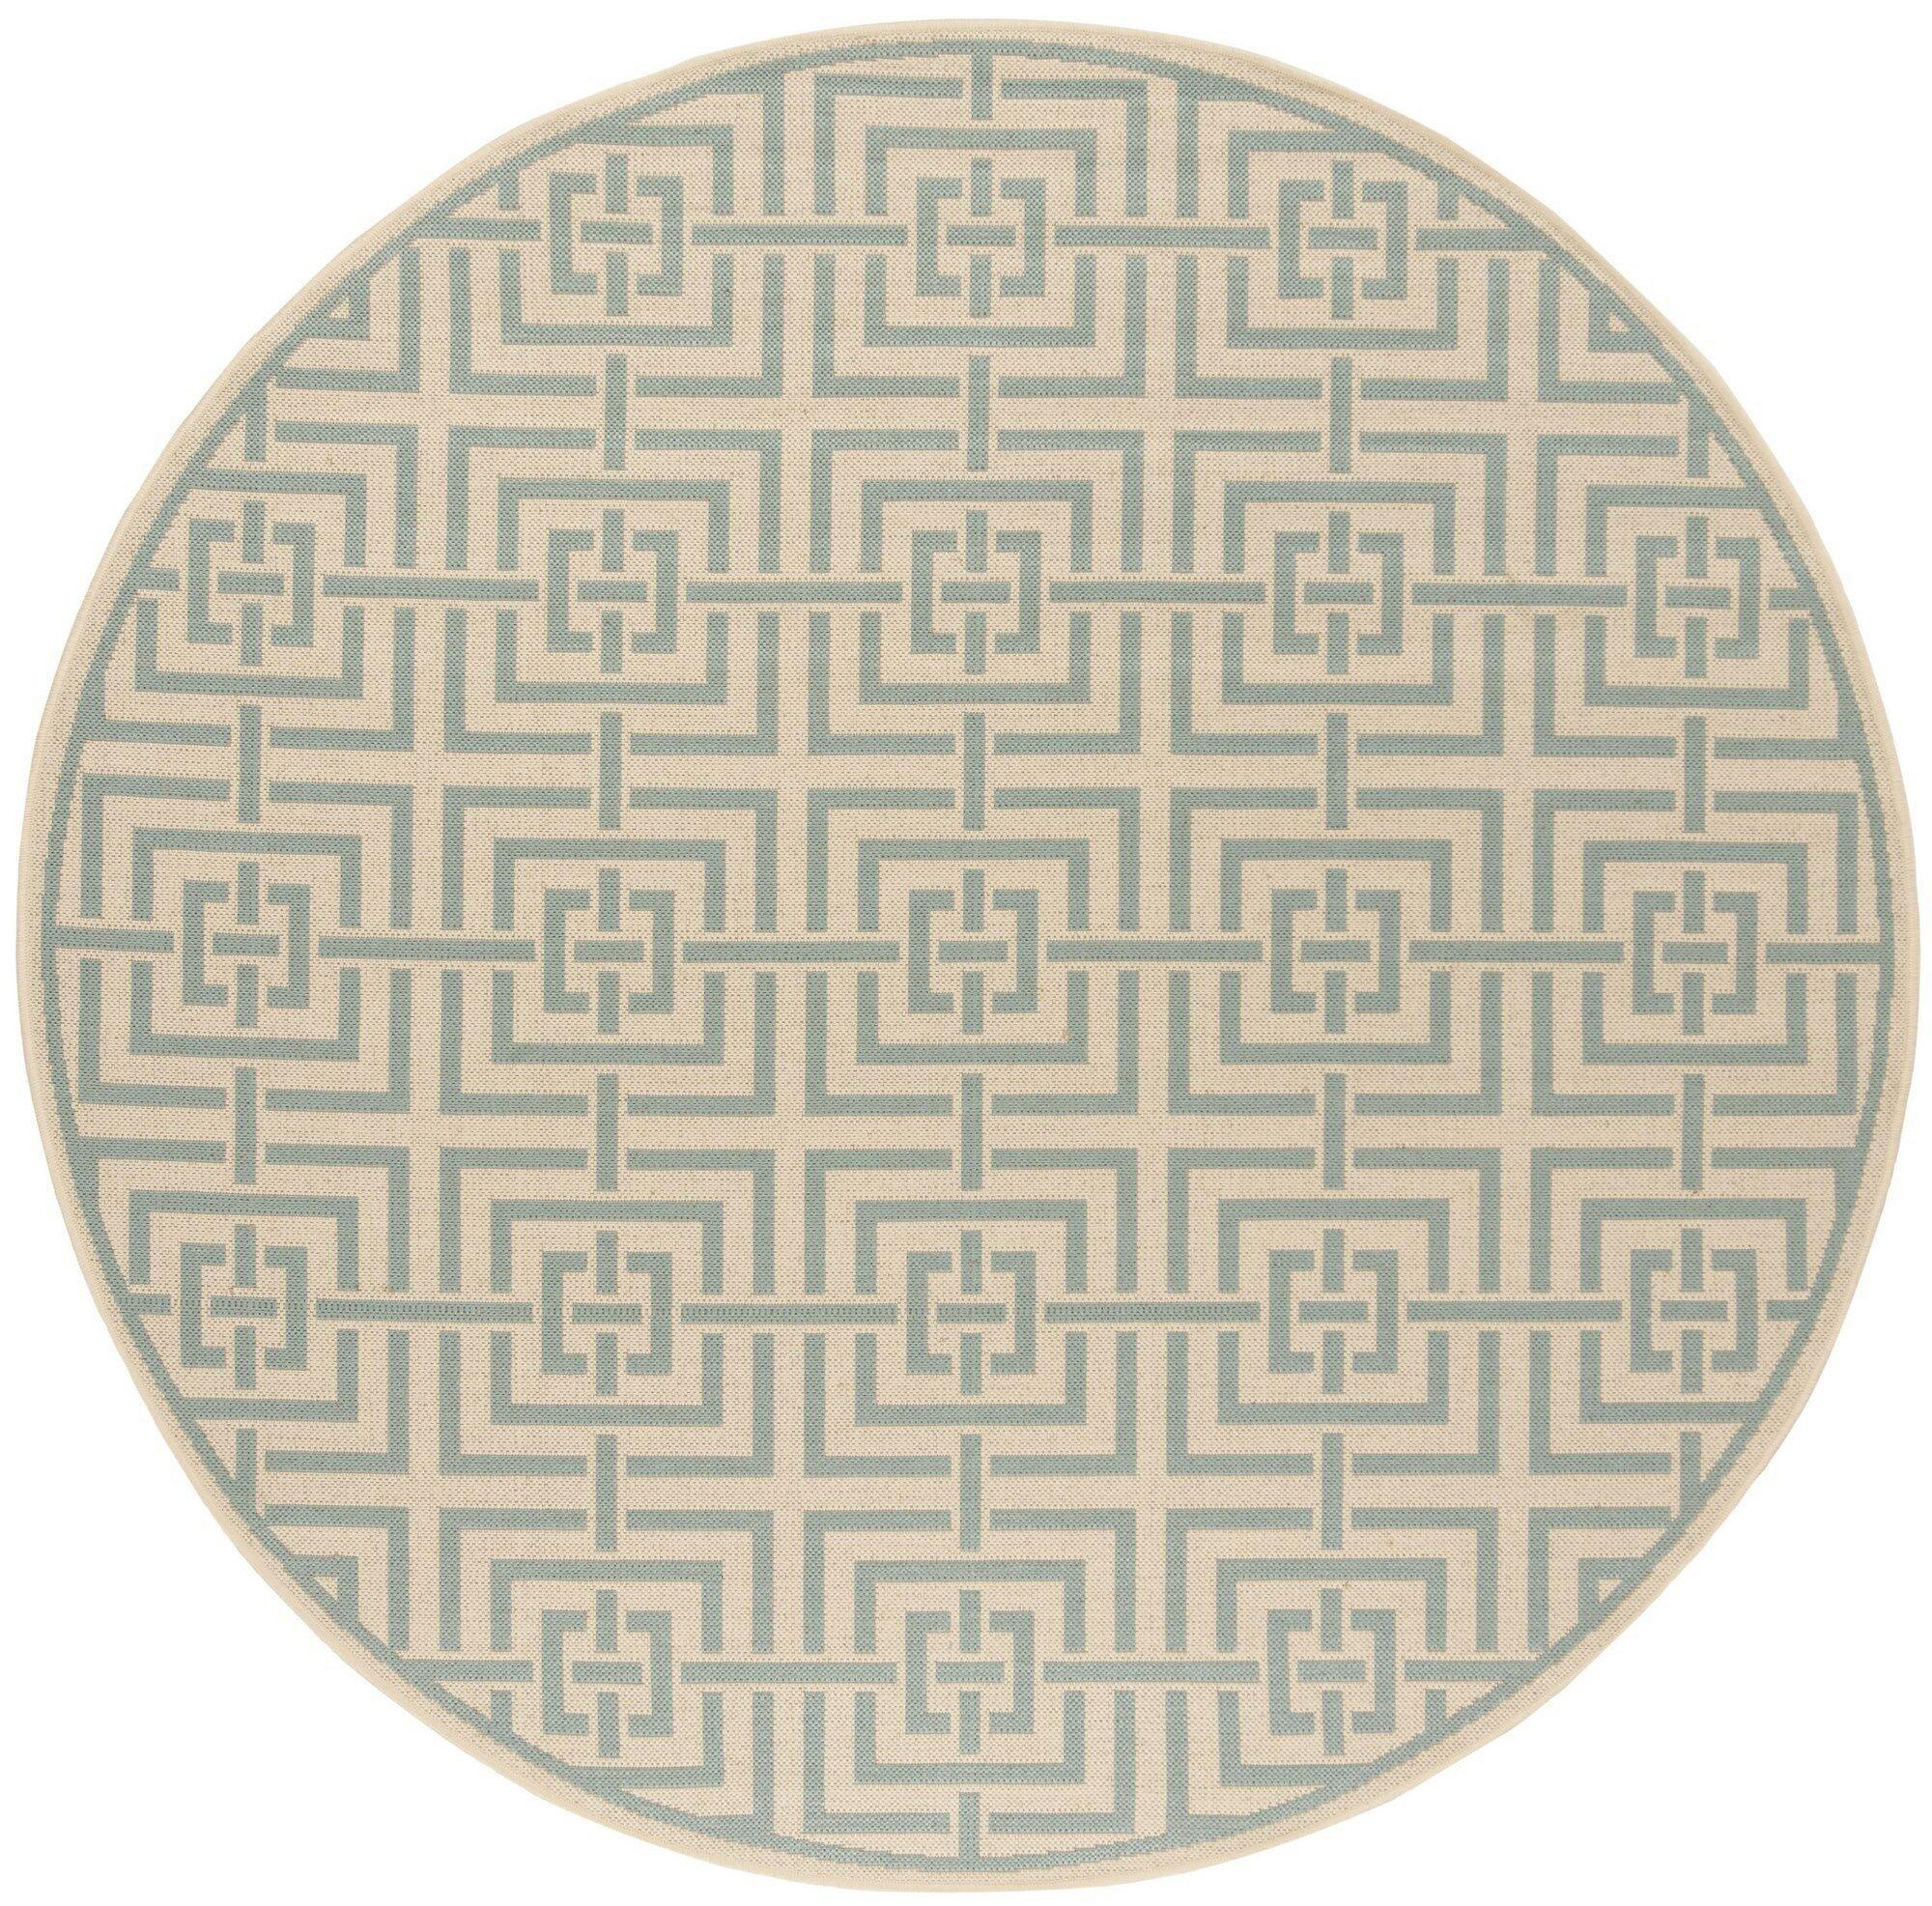 Shea Cream/Aqua Area Rug Rug Size: Round 6'7